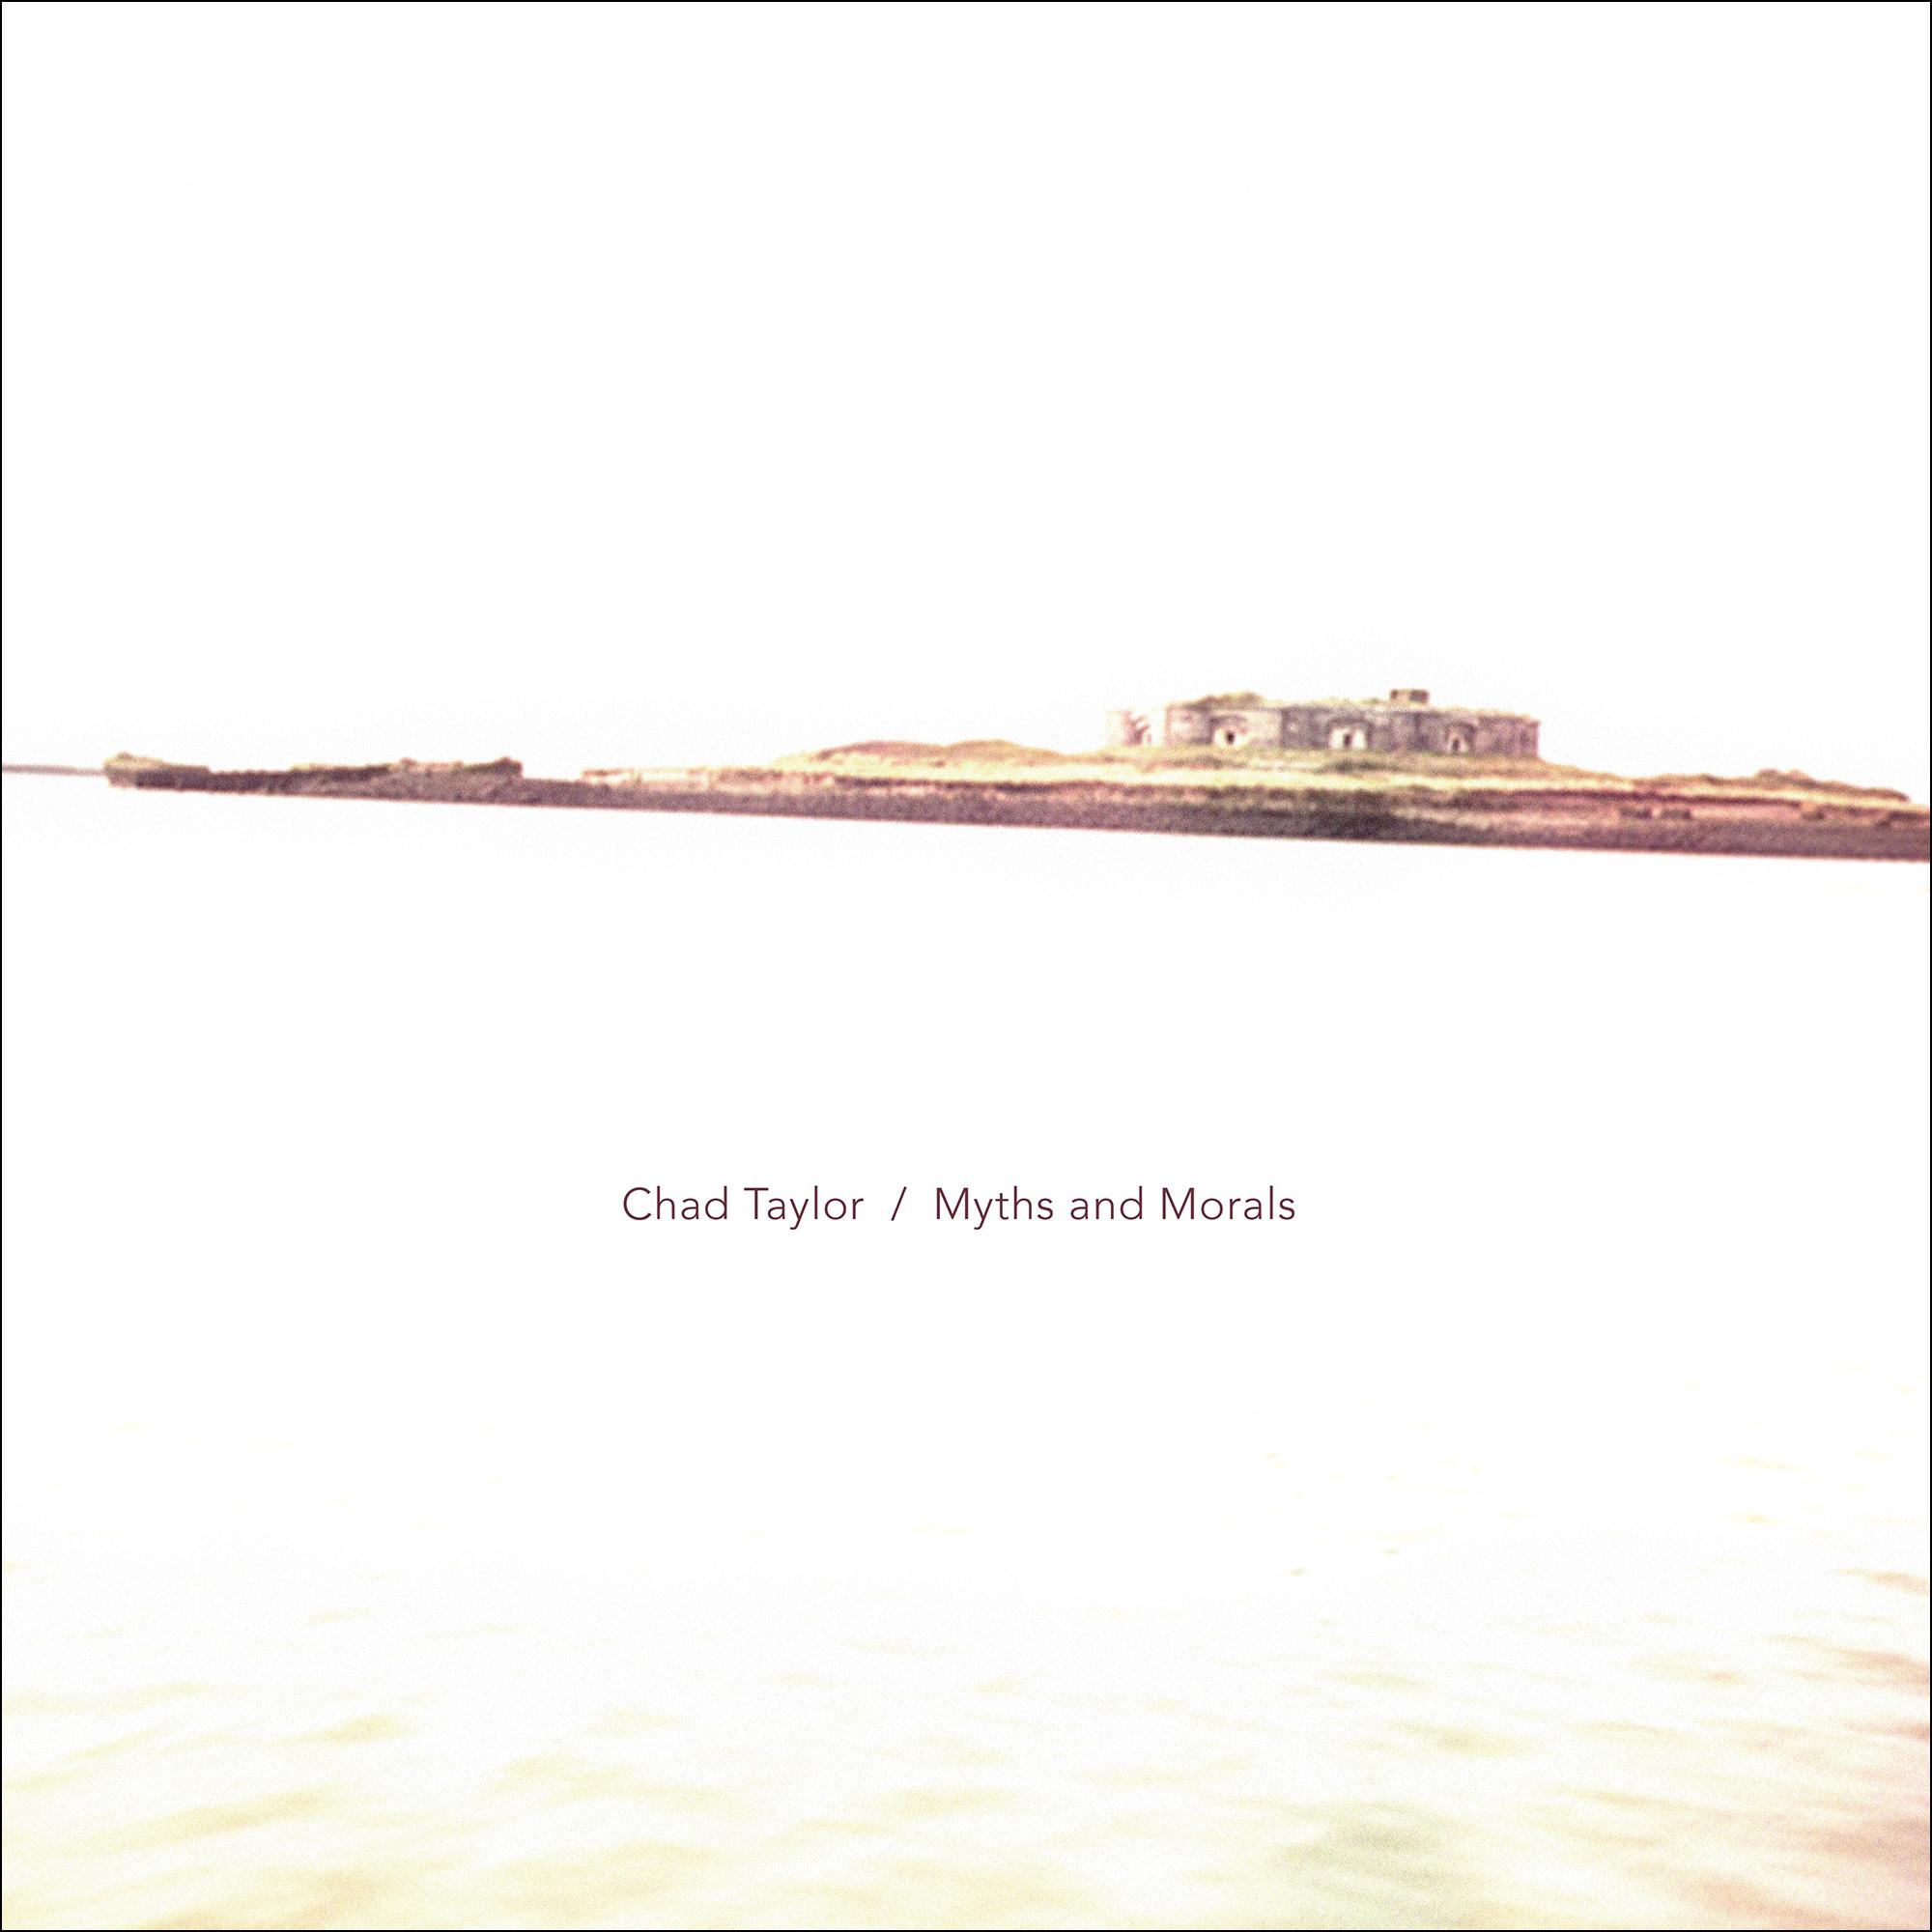 Chad Taylor | Myths and Morals